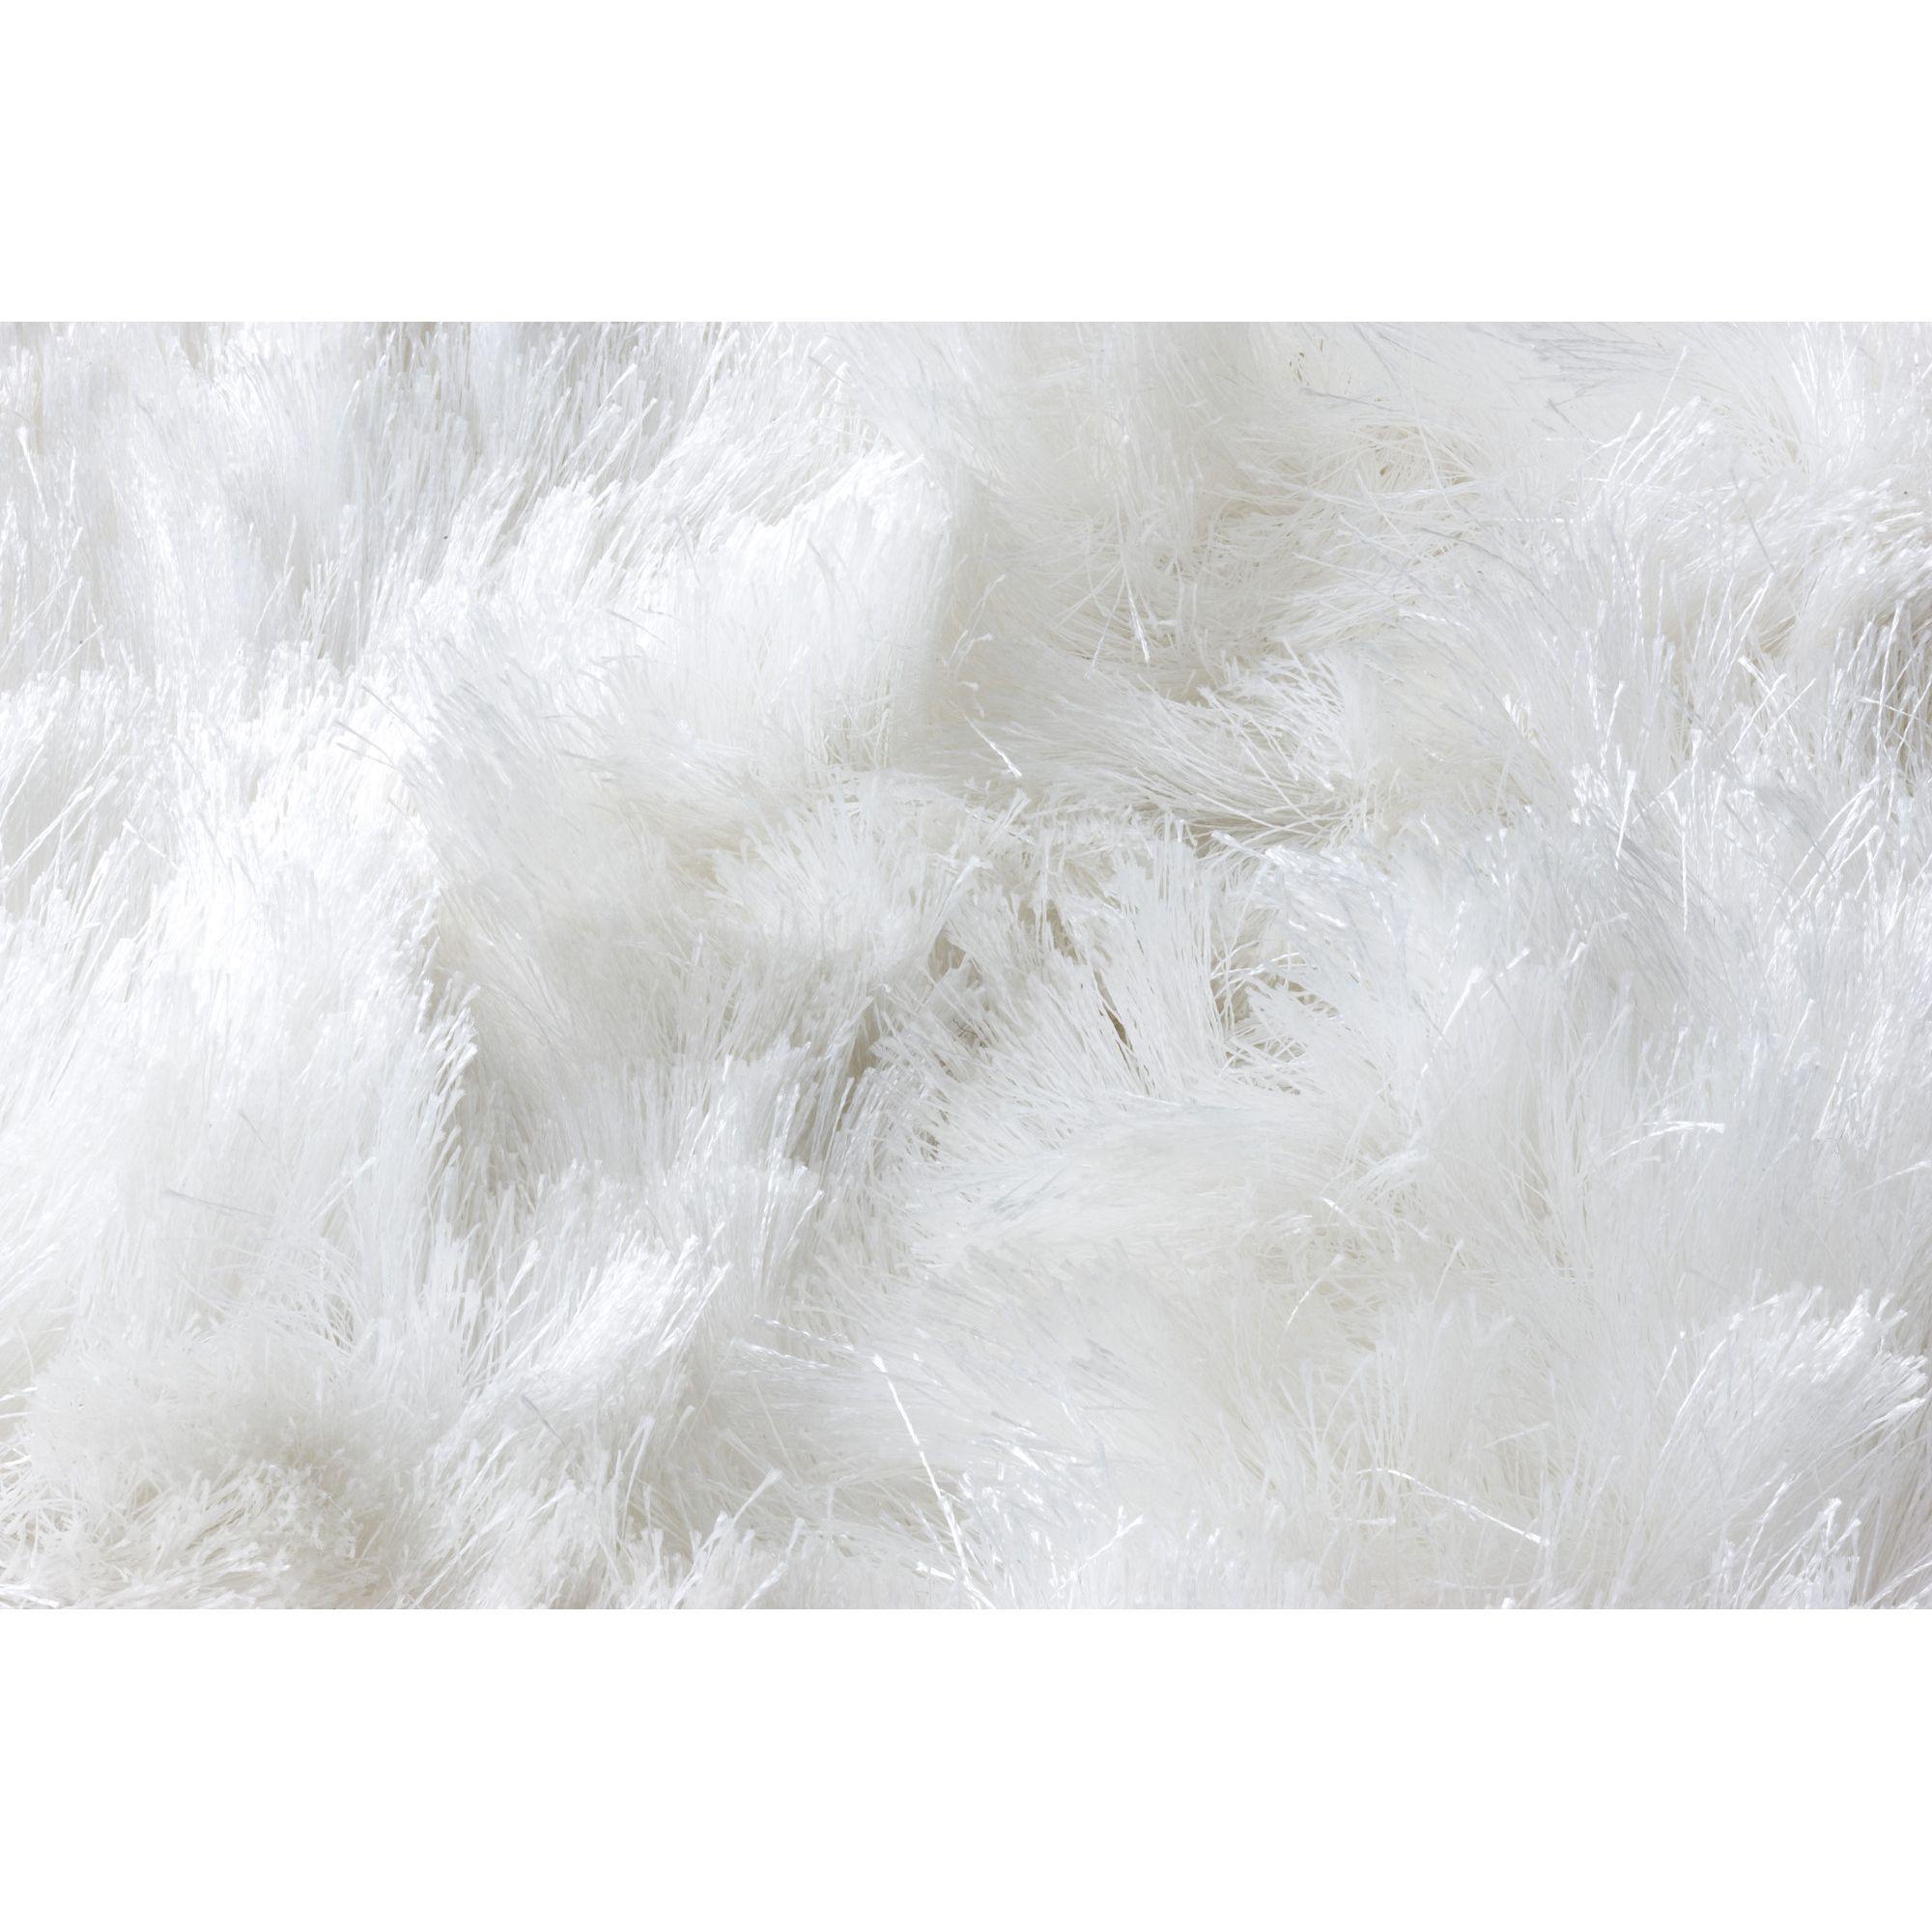 Linie Design Maltino White Shag Rug - 300cm x 200cm at Tesco Direct